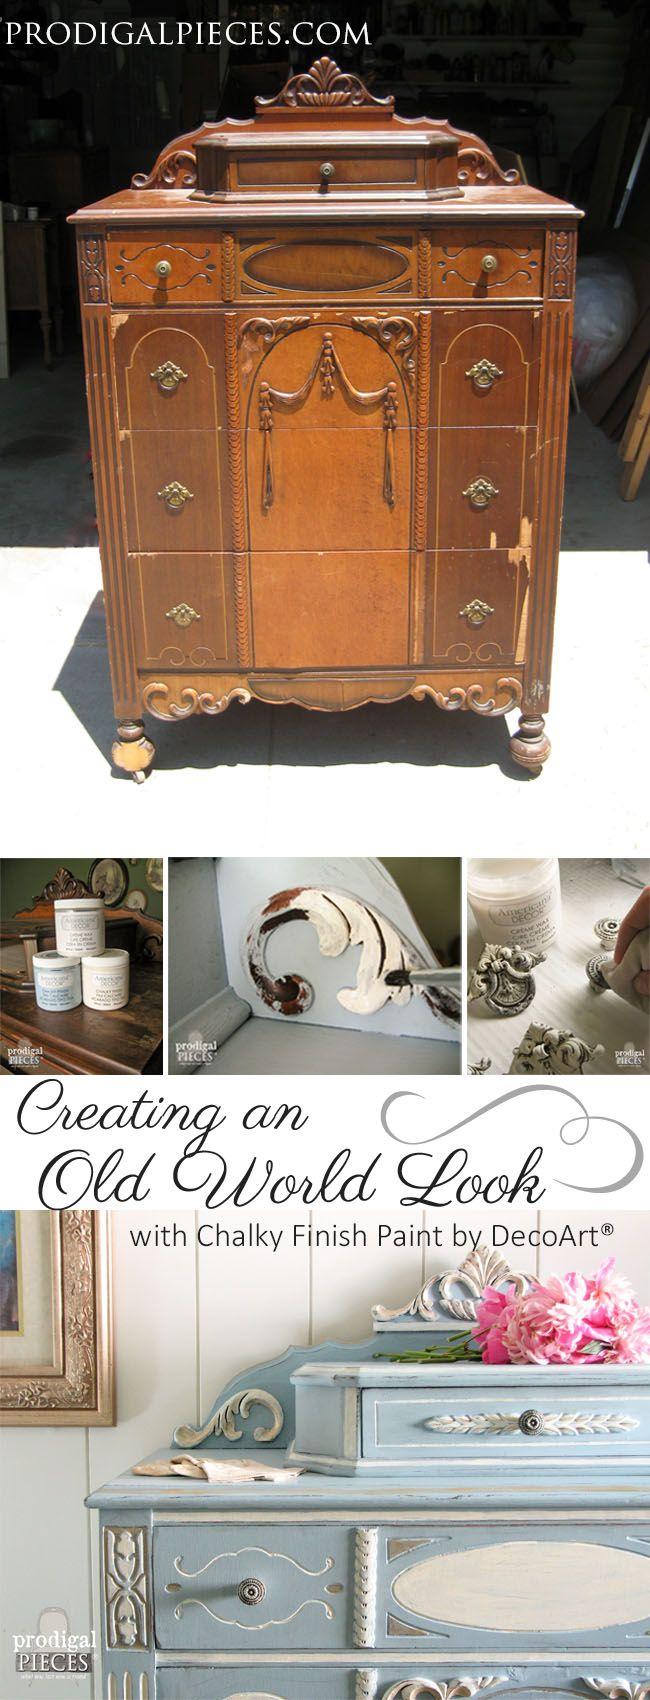 best decor ideas images on pinterest painted furniture antique